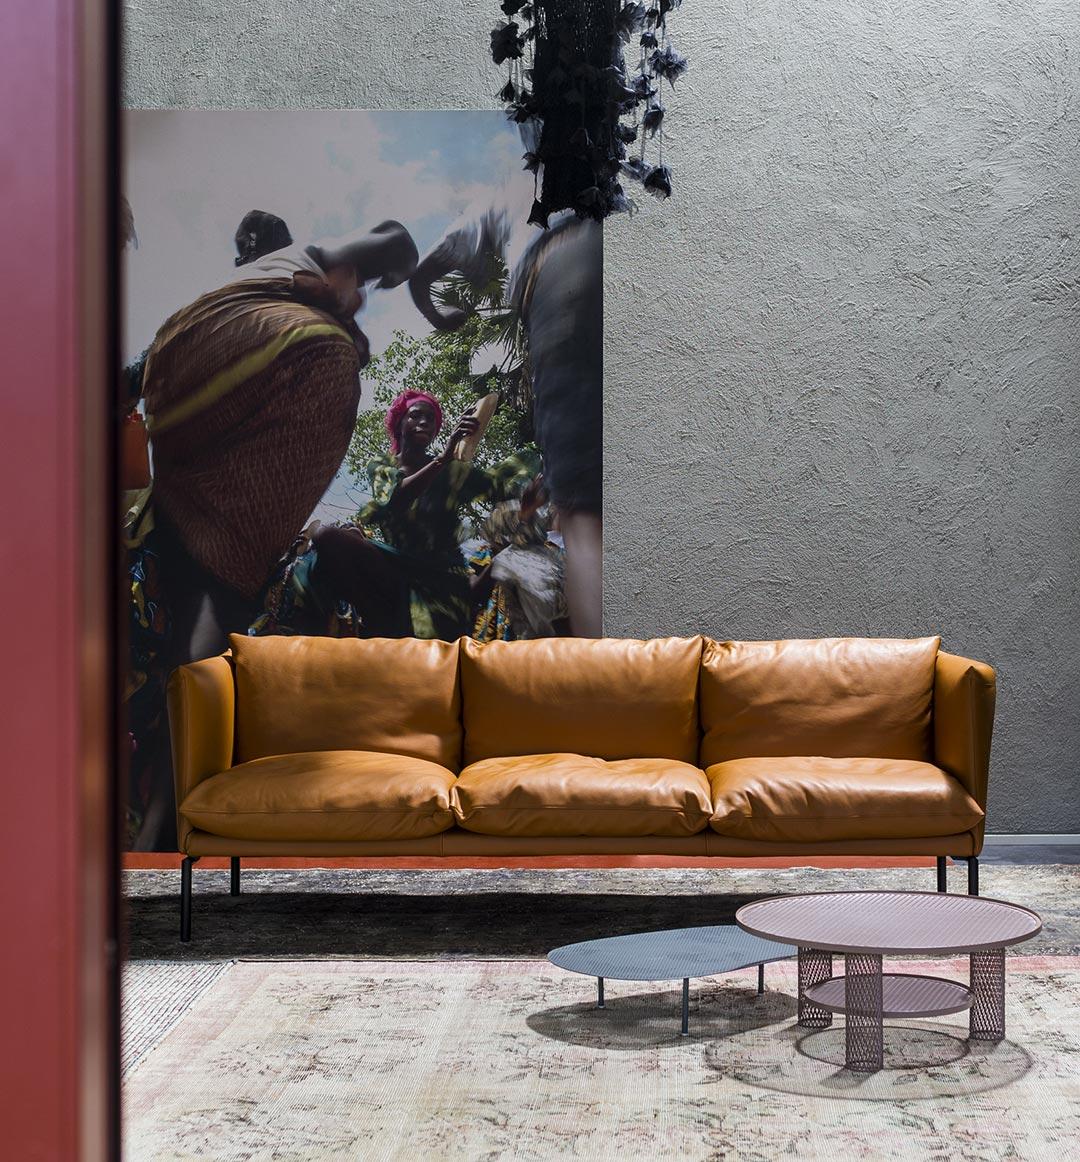 Moroso Gentry - Anteprime divani Salone del Mobile 2018.